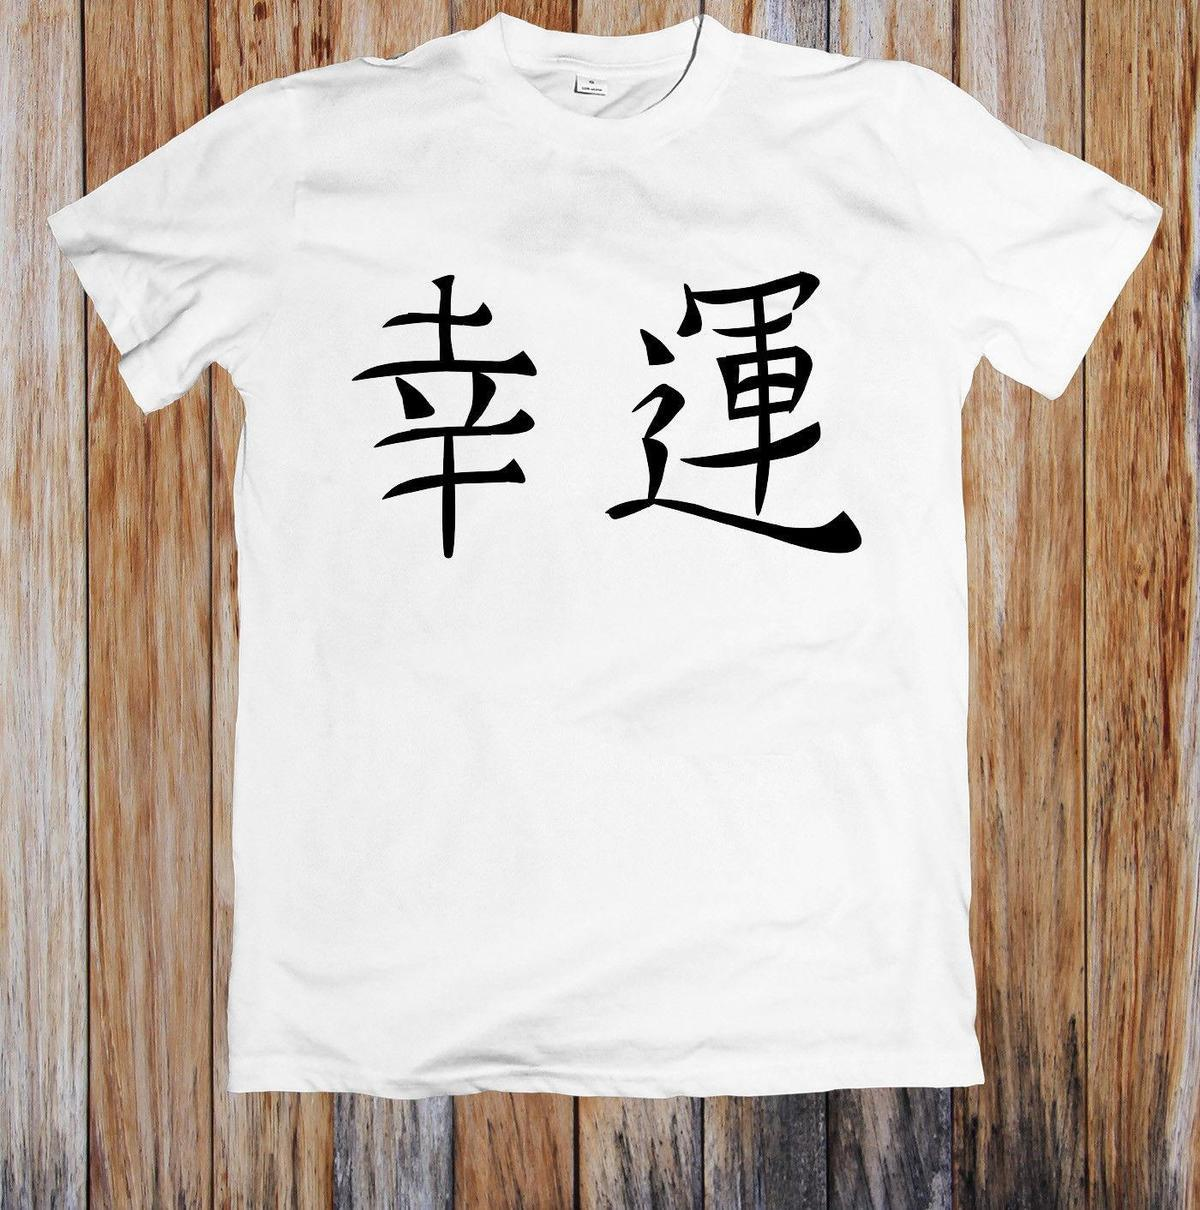 Japanese Good Luck Kanji Unisex T Shirt Short Sleeve Shirts Cheap